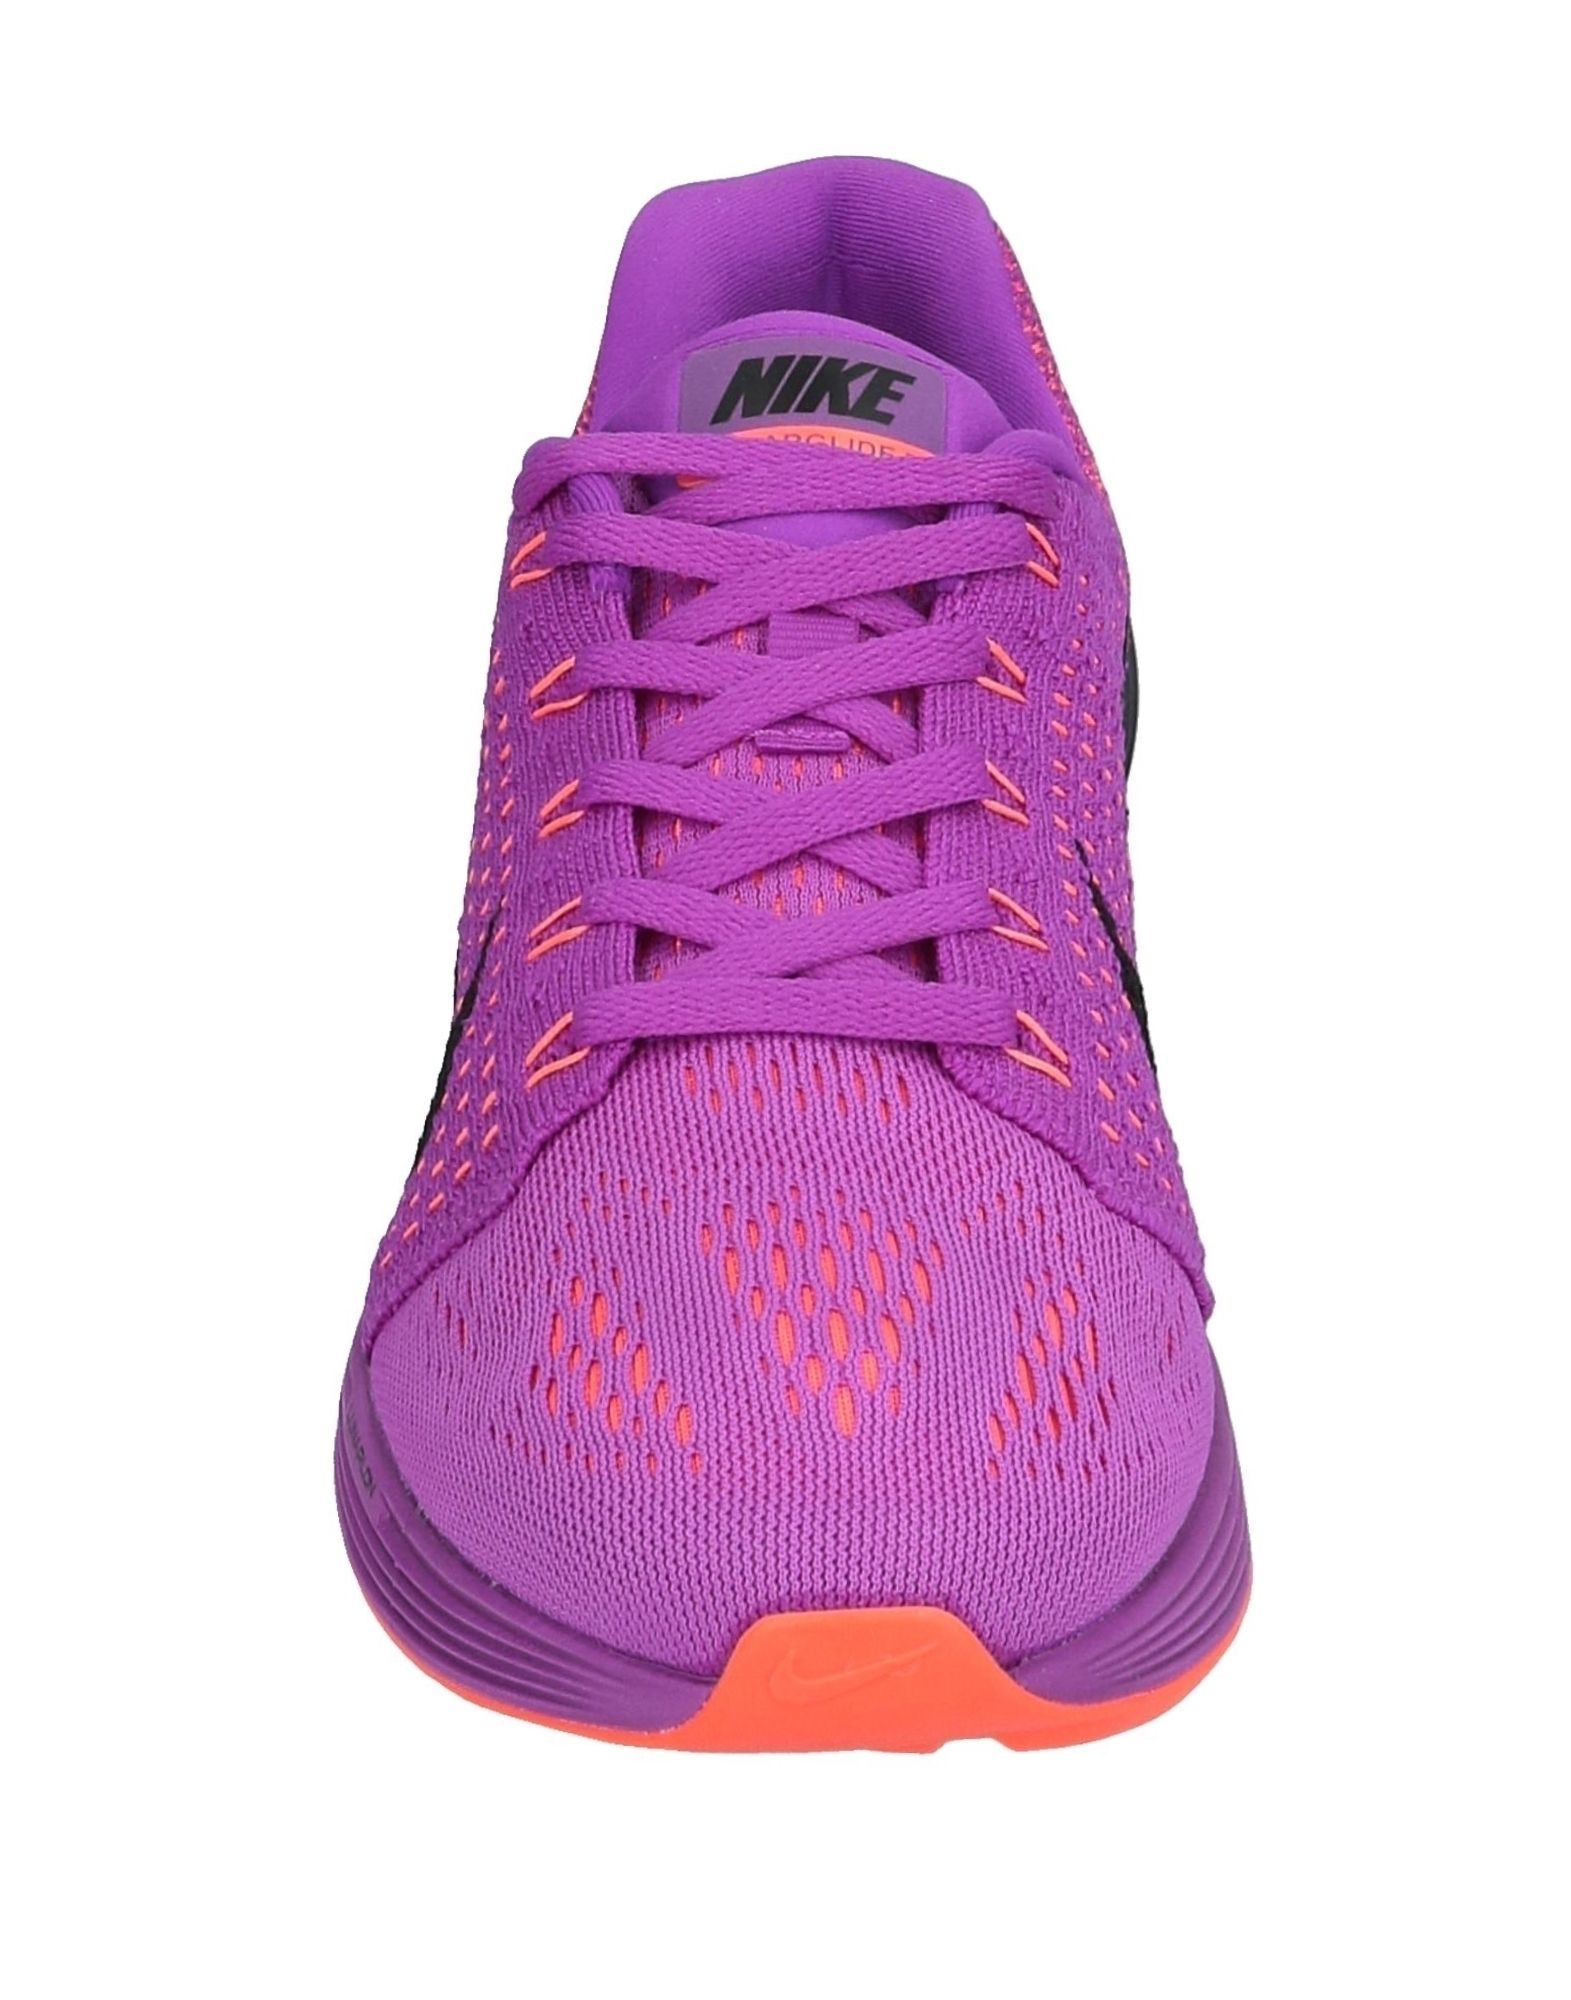 Nike Sneakers Damen  11558859TJ Schuhe Gute Qualität beliebte Schuhe 11558859TJ 559a3e